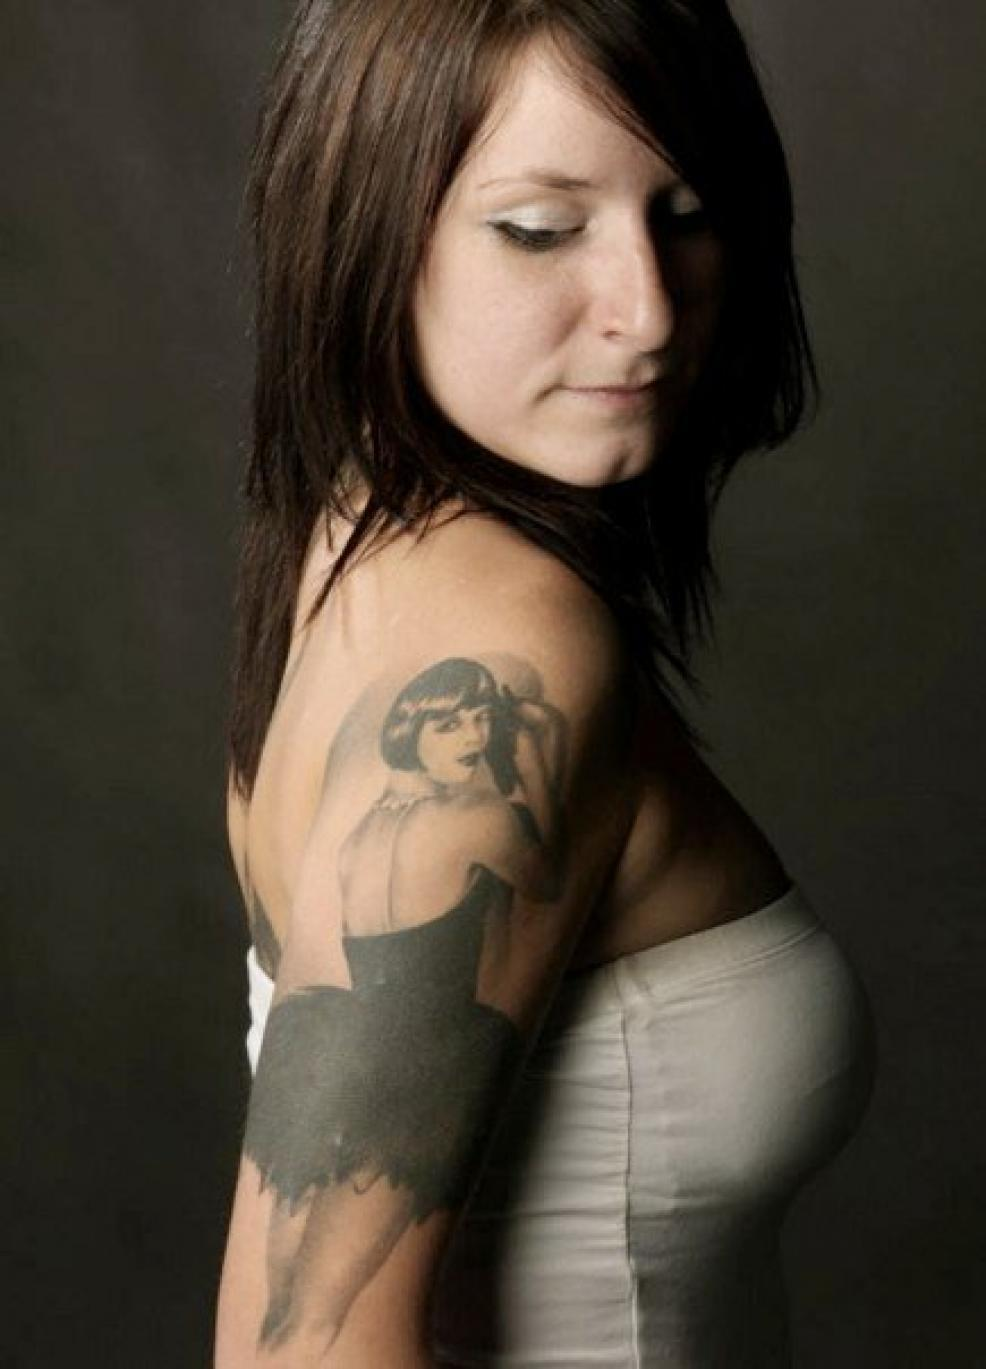 Atom Bomb Tattoo | Artist: Dave, Model: Joy Adamson